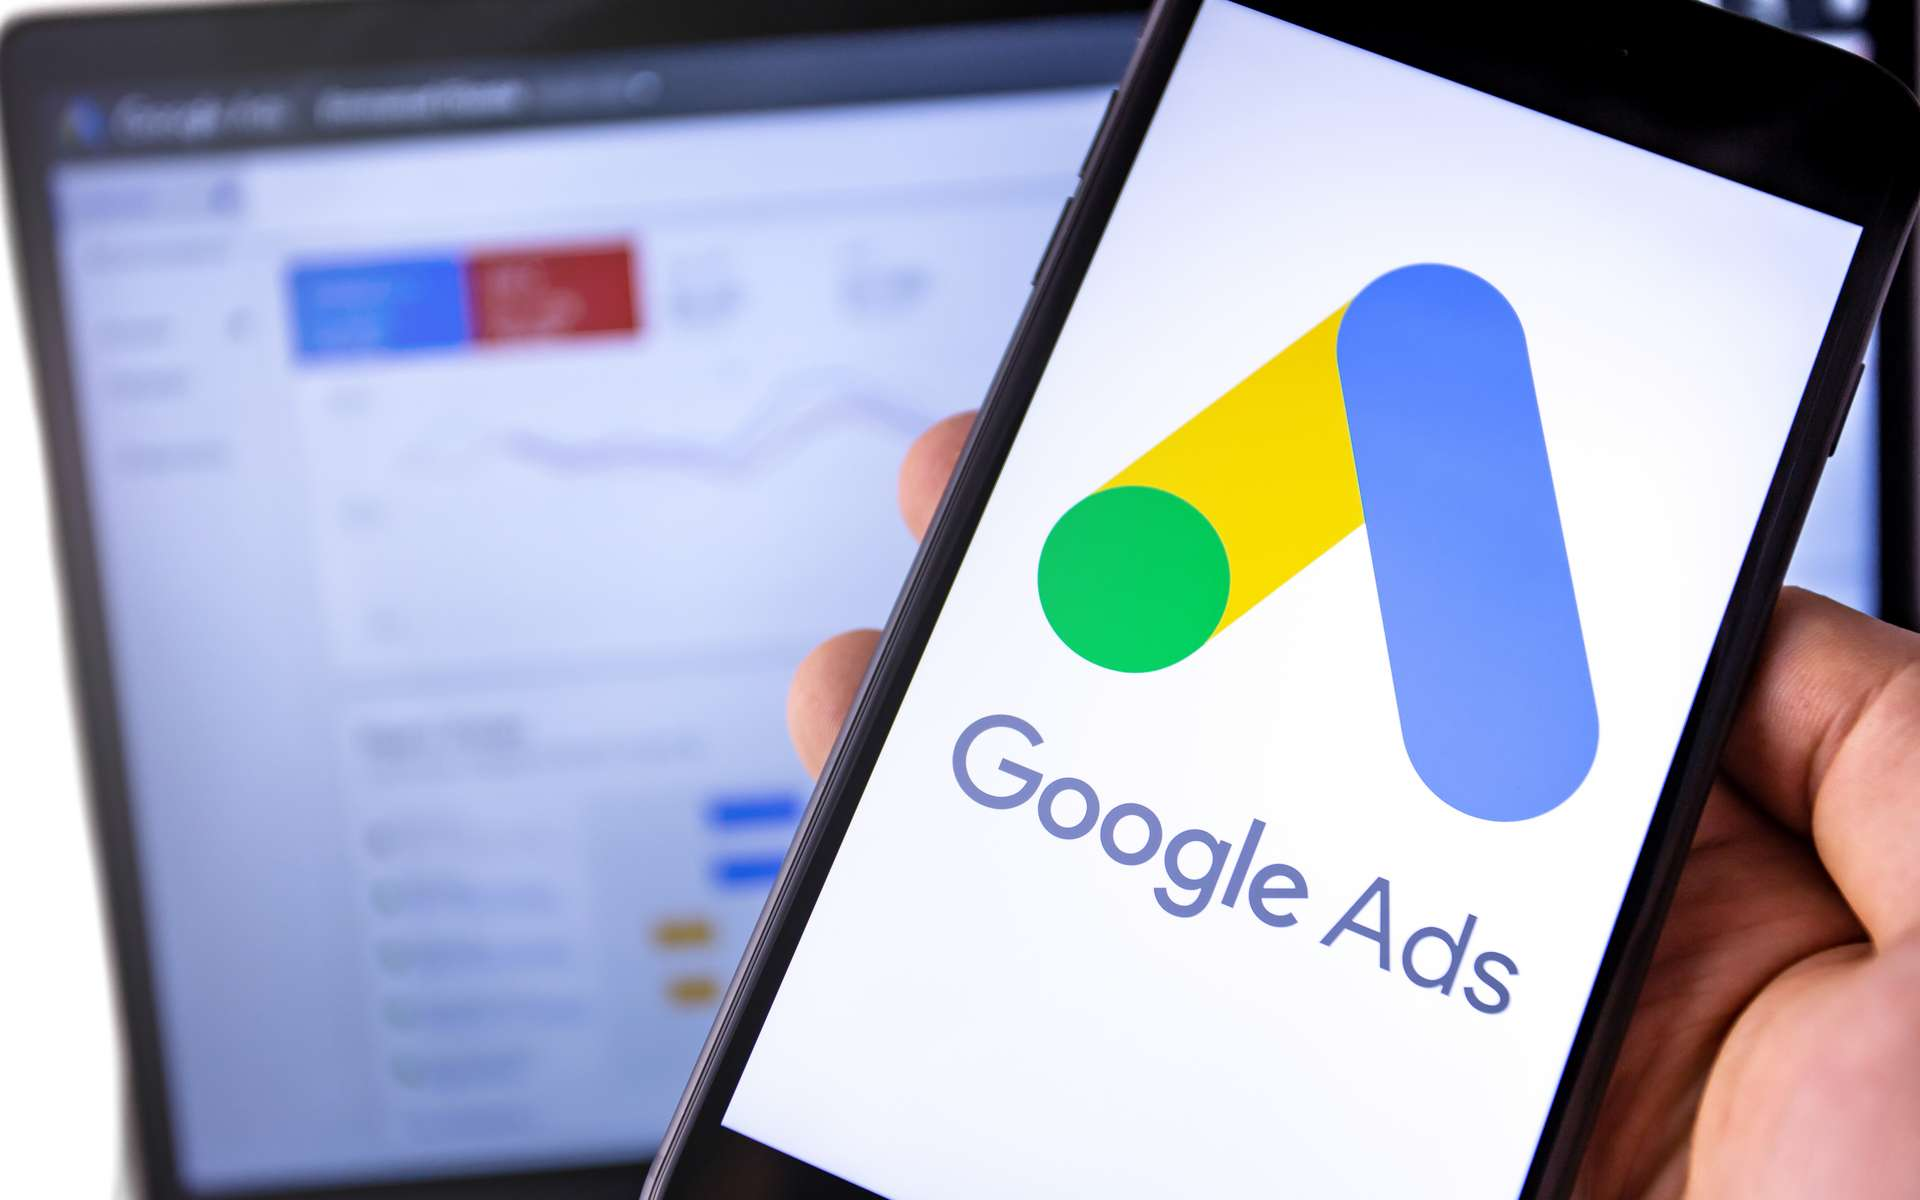 Formation Google Ads © prima91, Adobe Stock